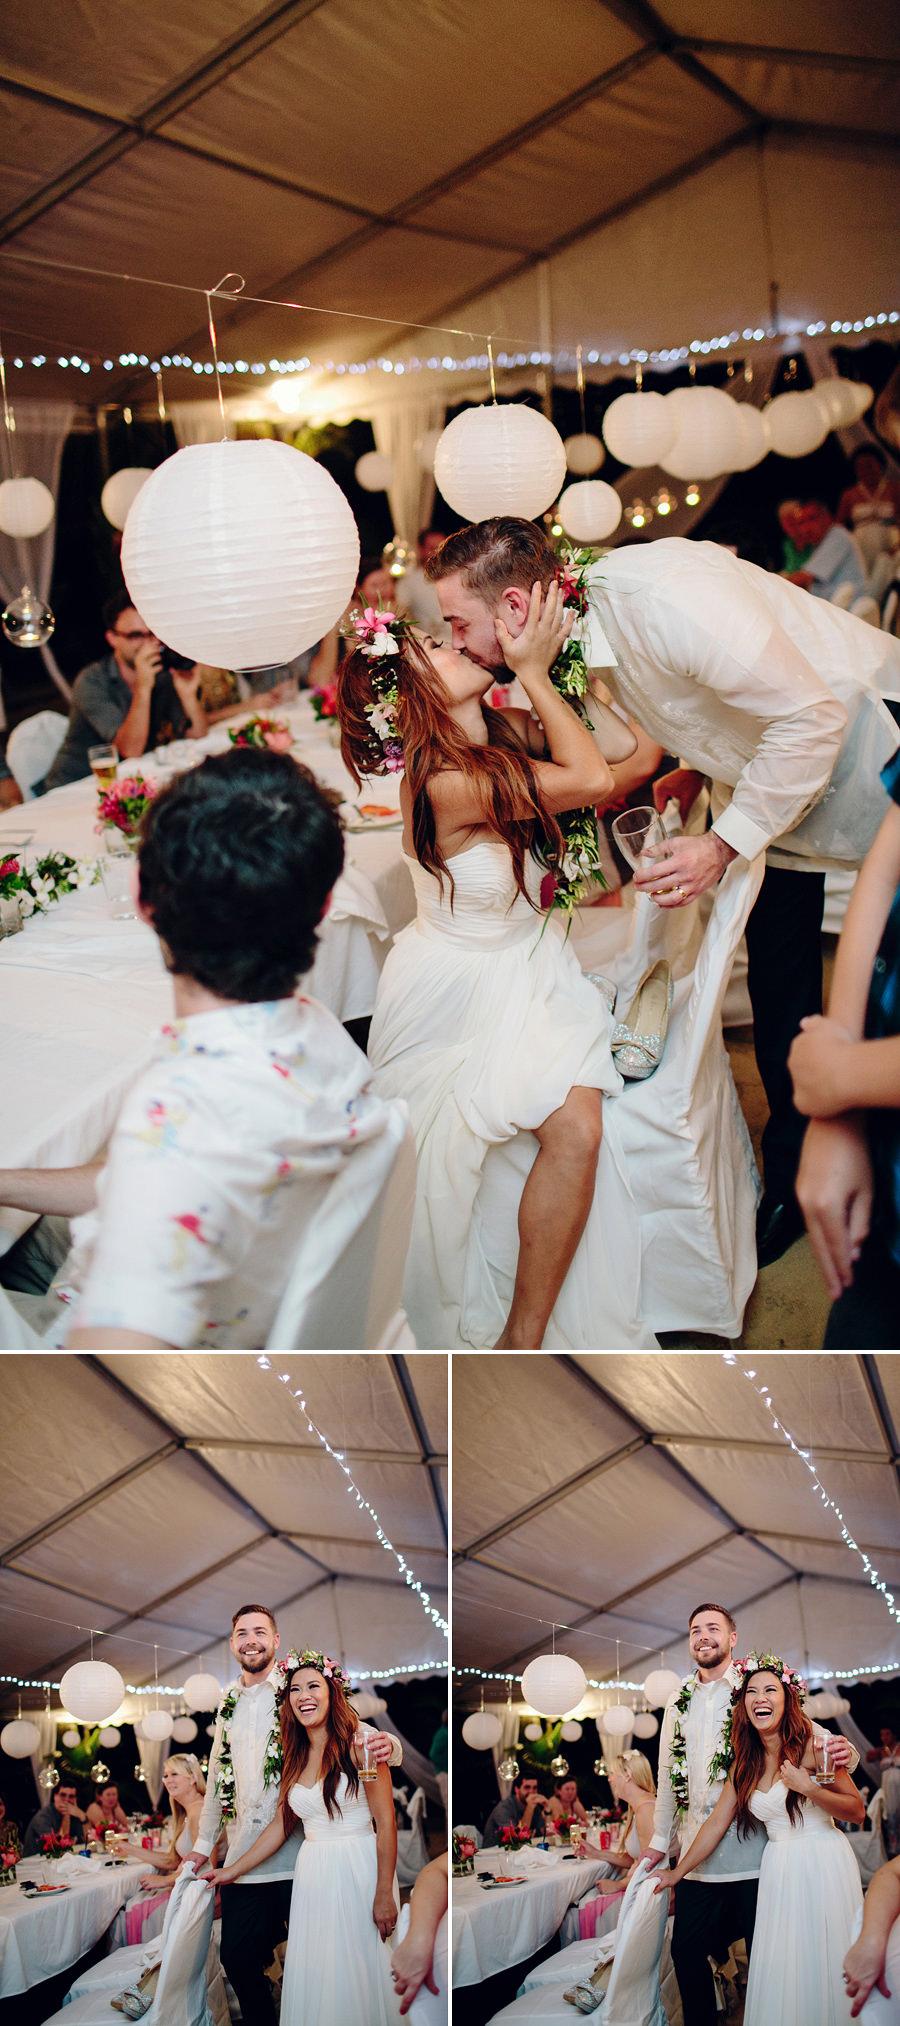 Port Vila Wedding Photography: Speeches